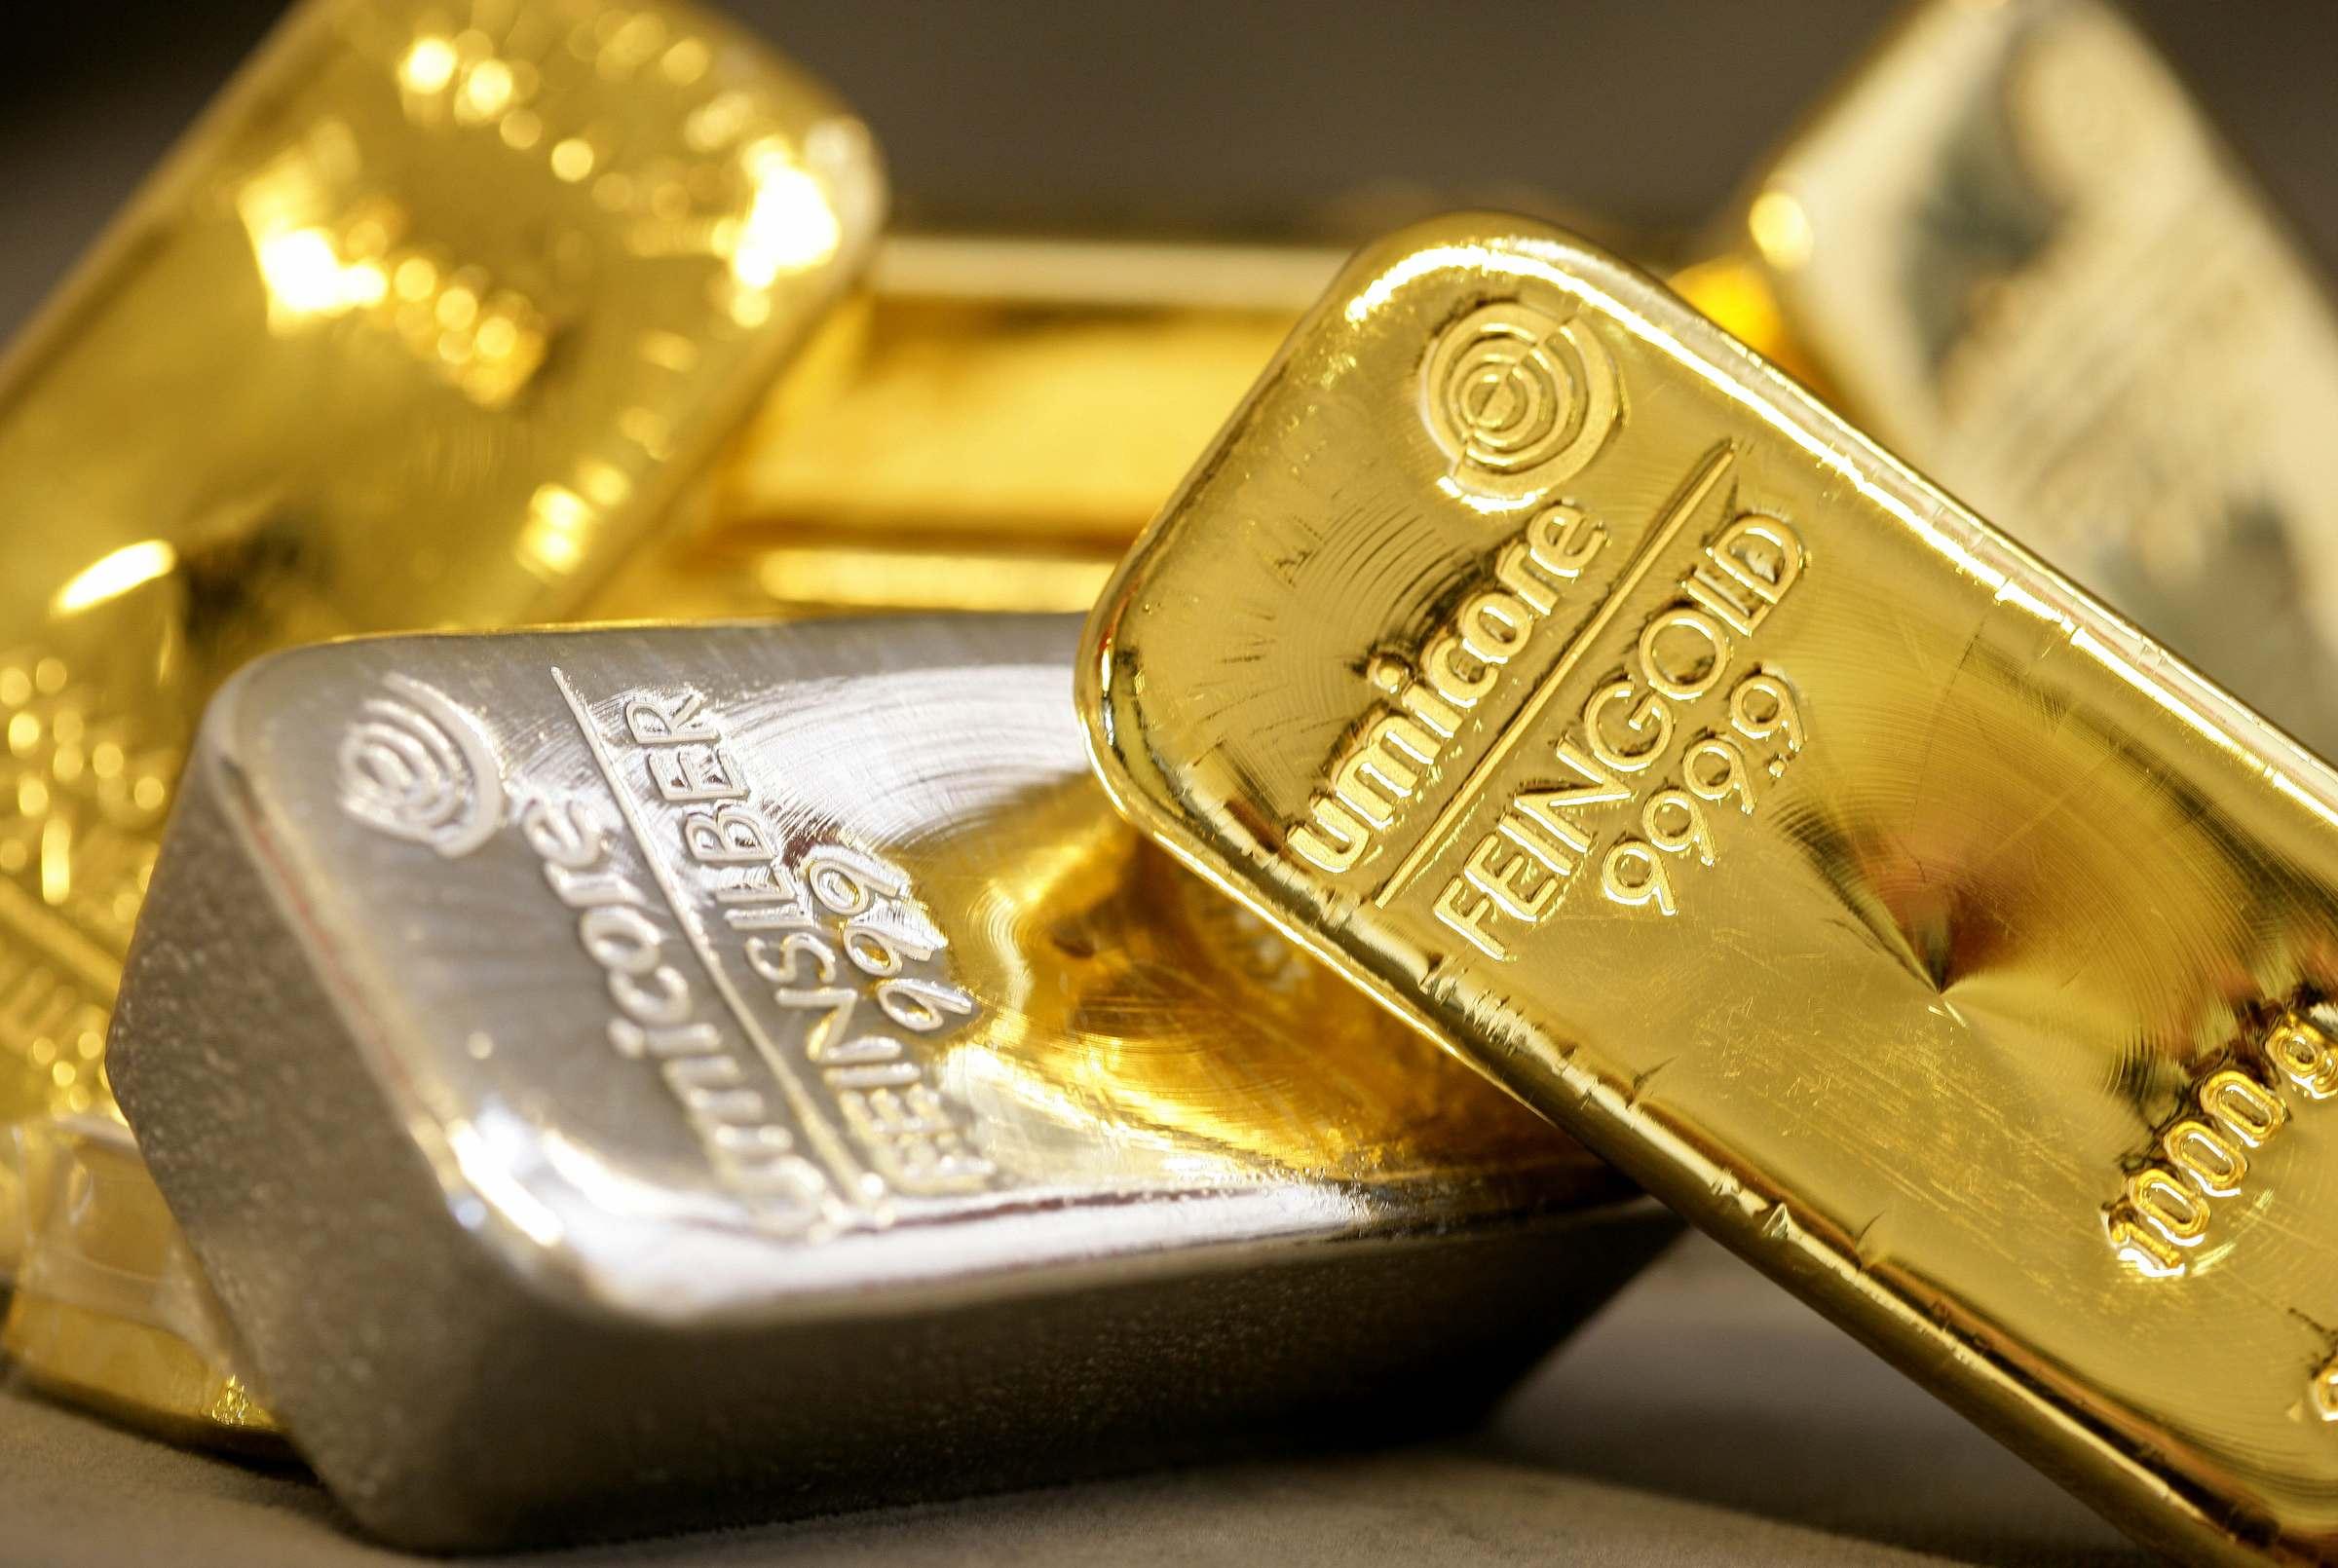 oro y plata refugio